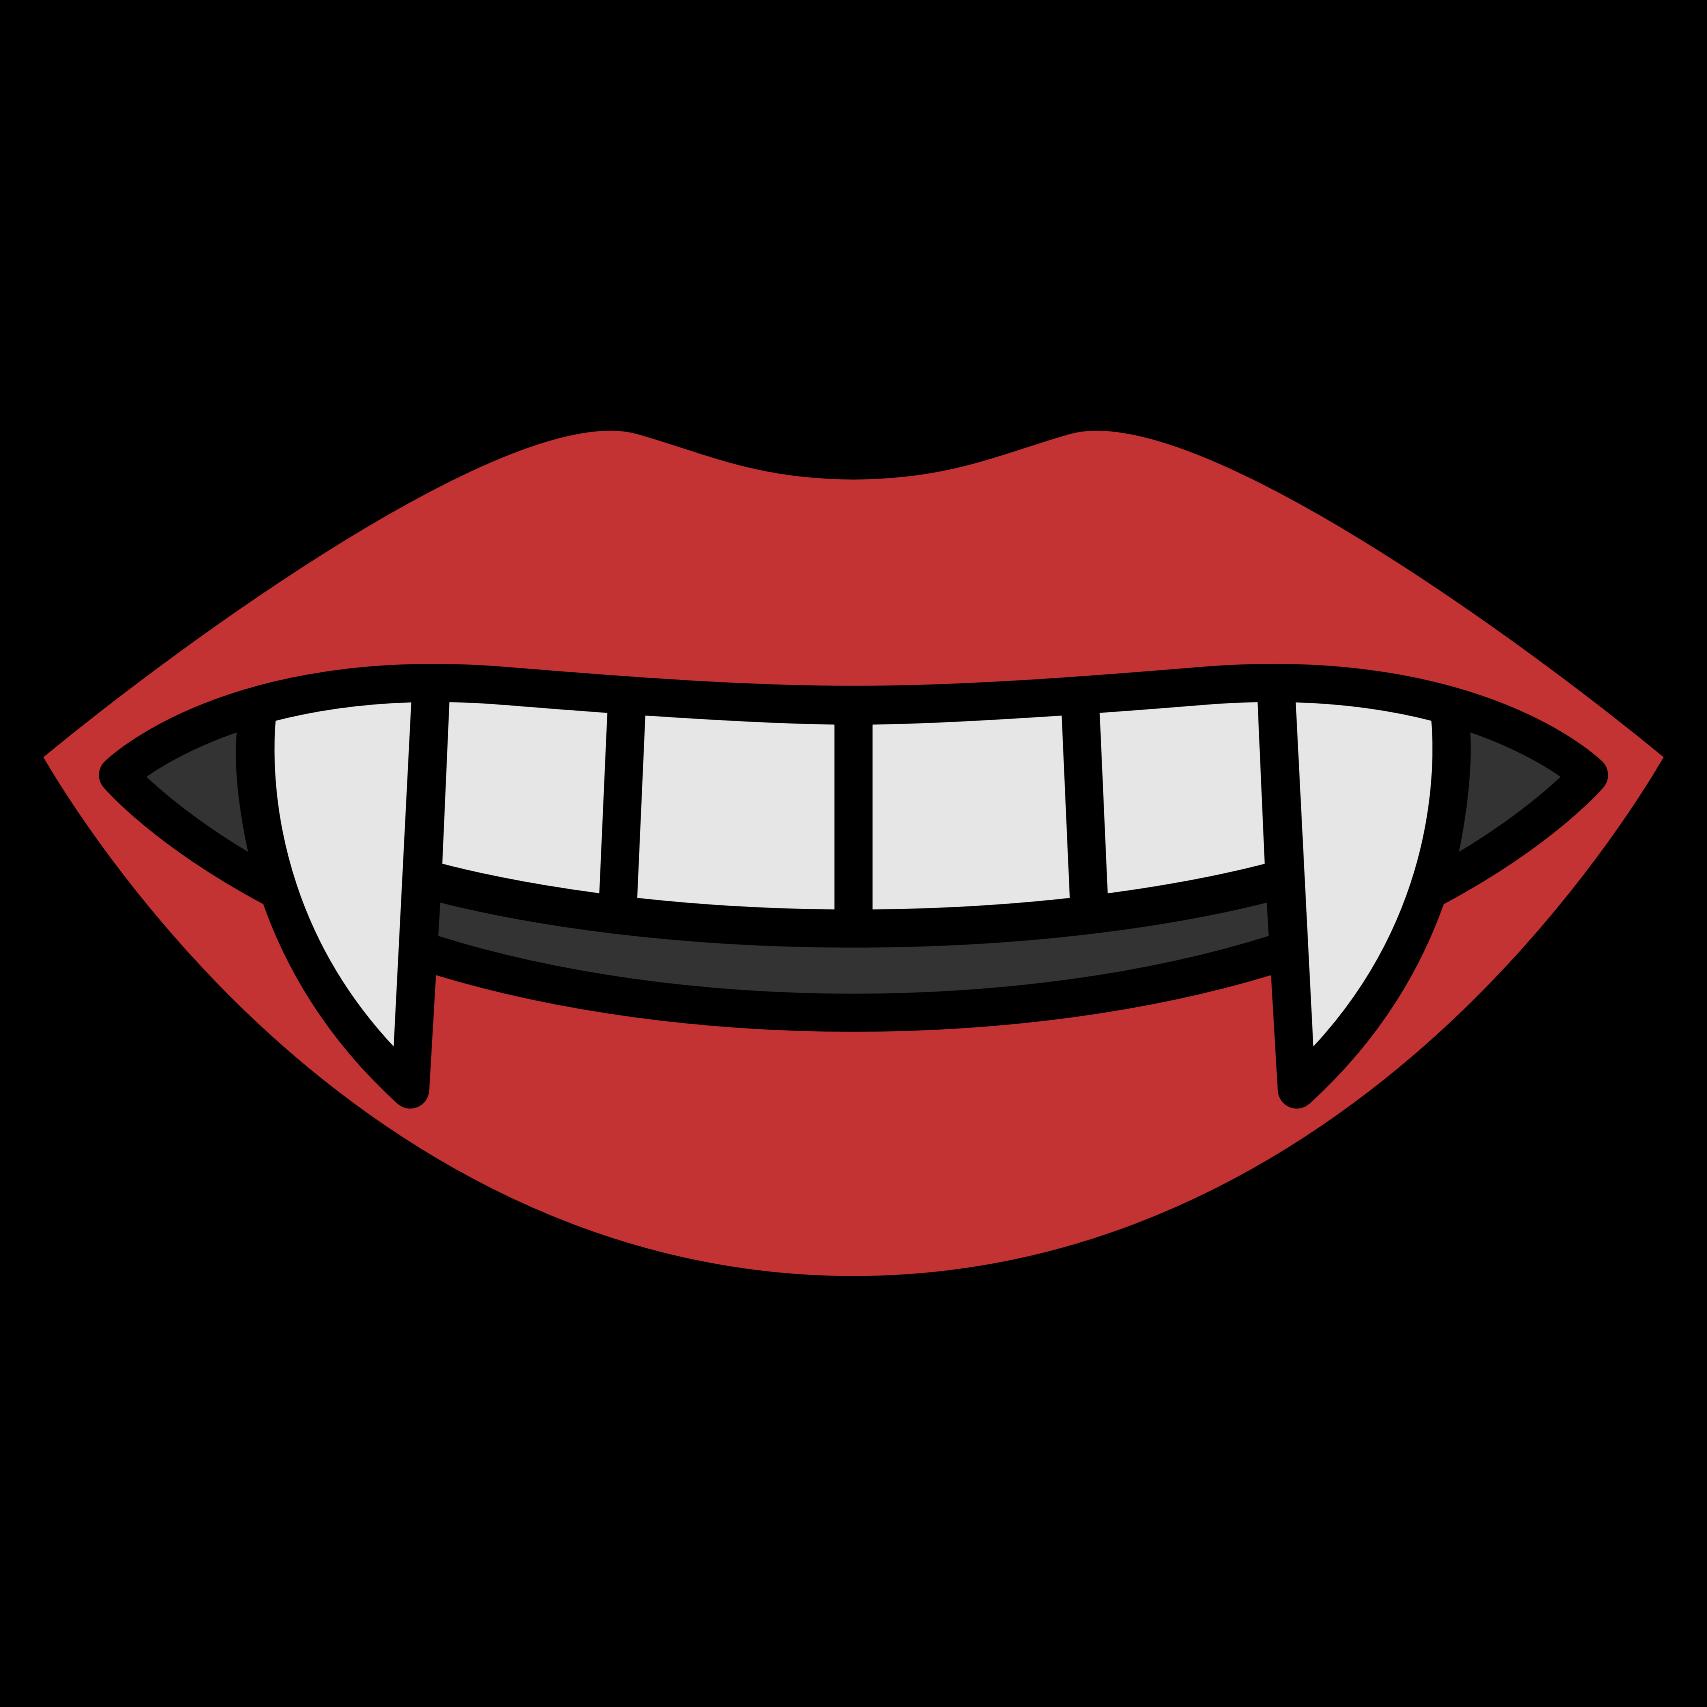 Lips clipart vampire. Mouth clip art teeth